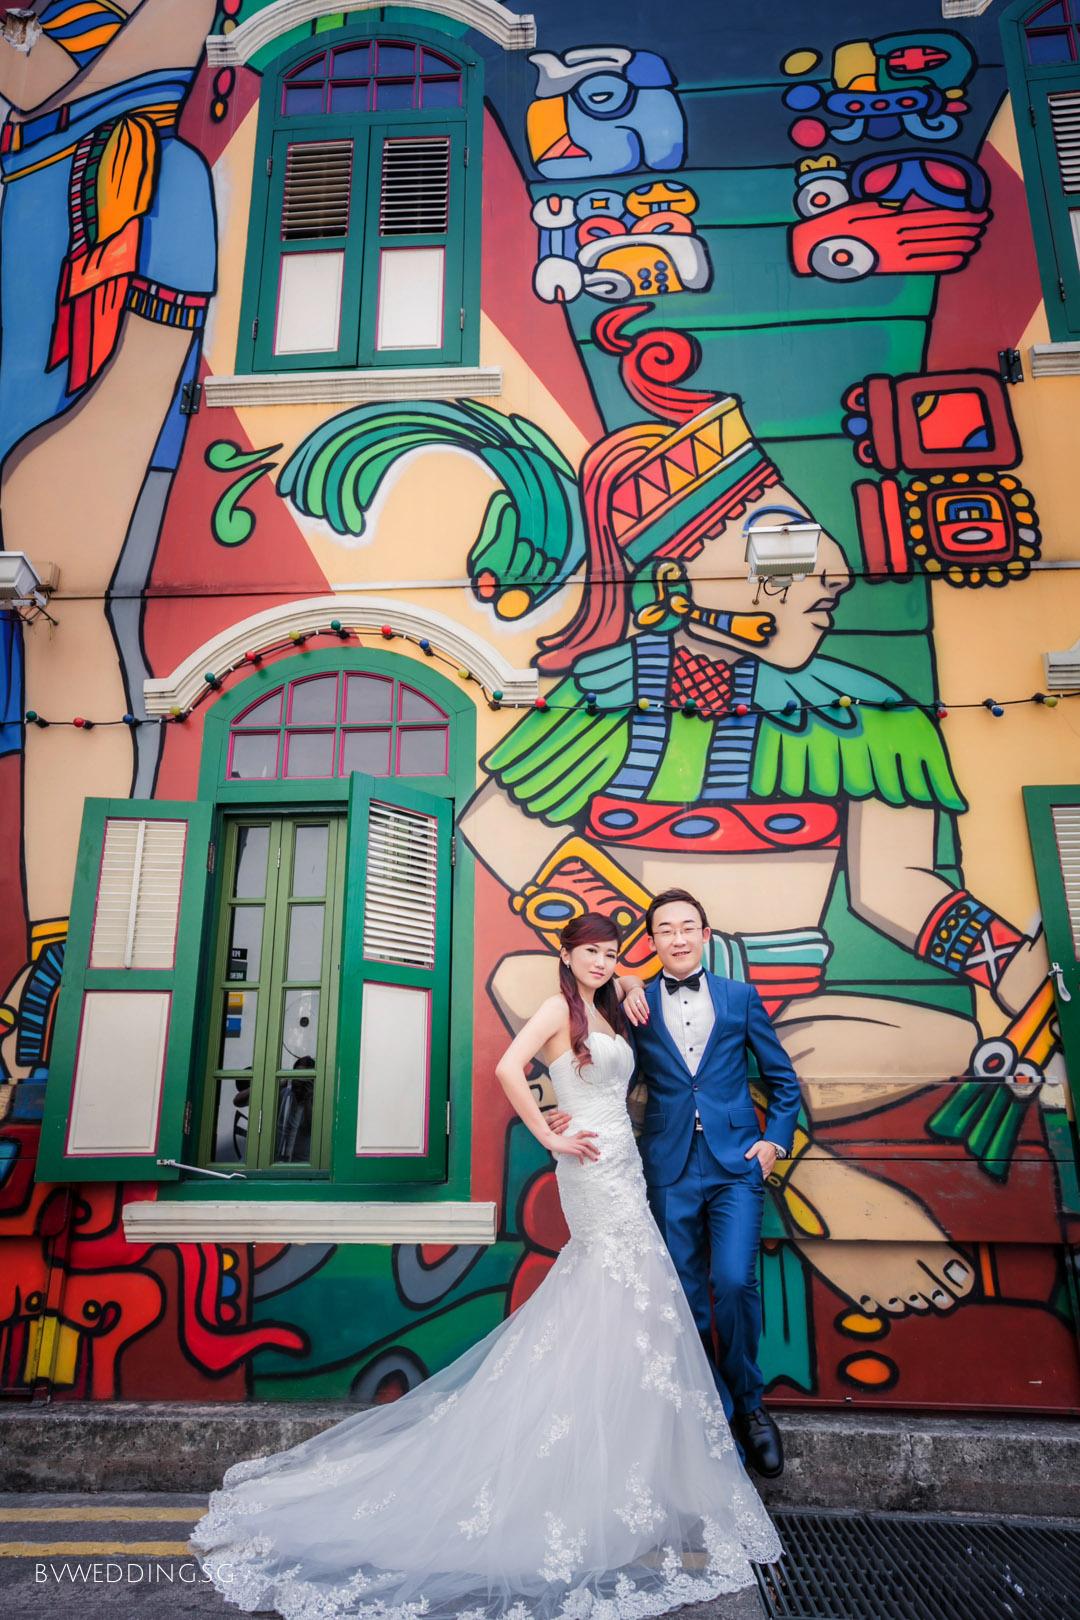 Pre-wedding photoshoot at haji lane